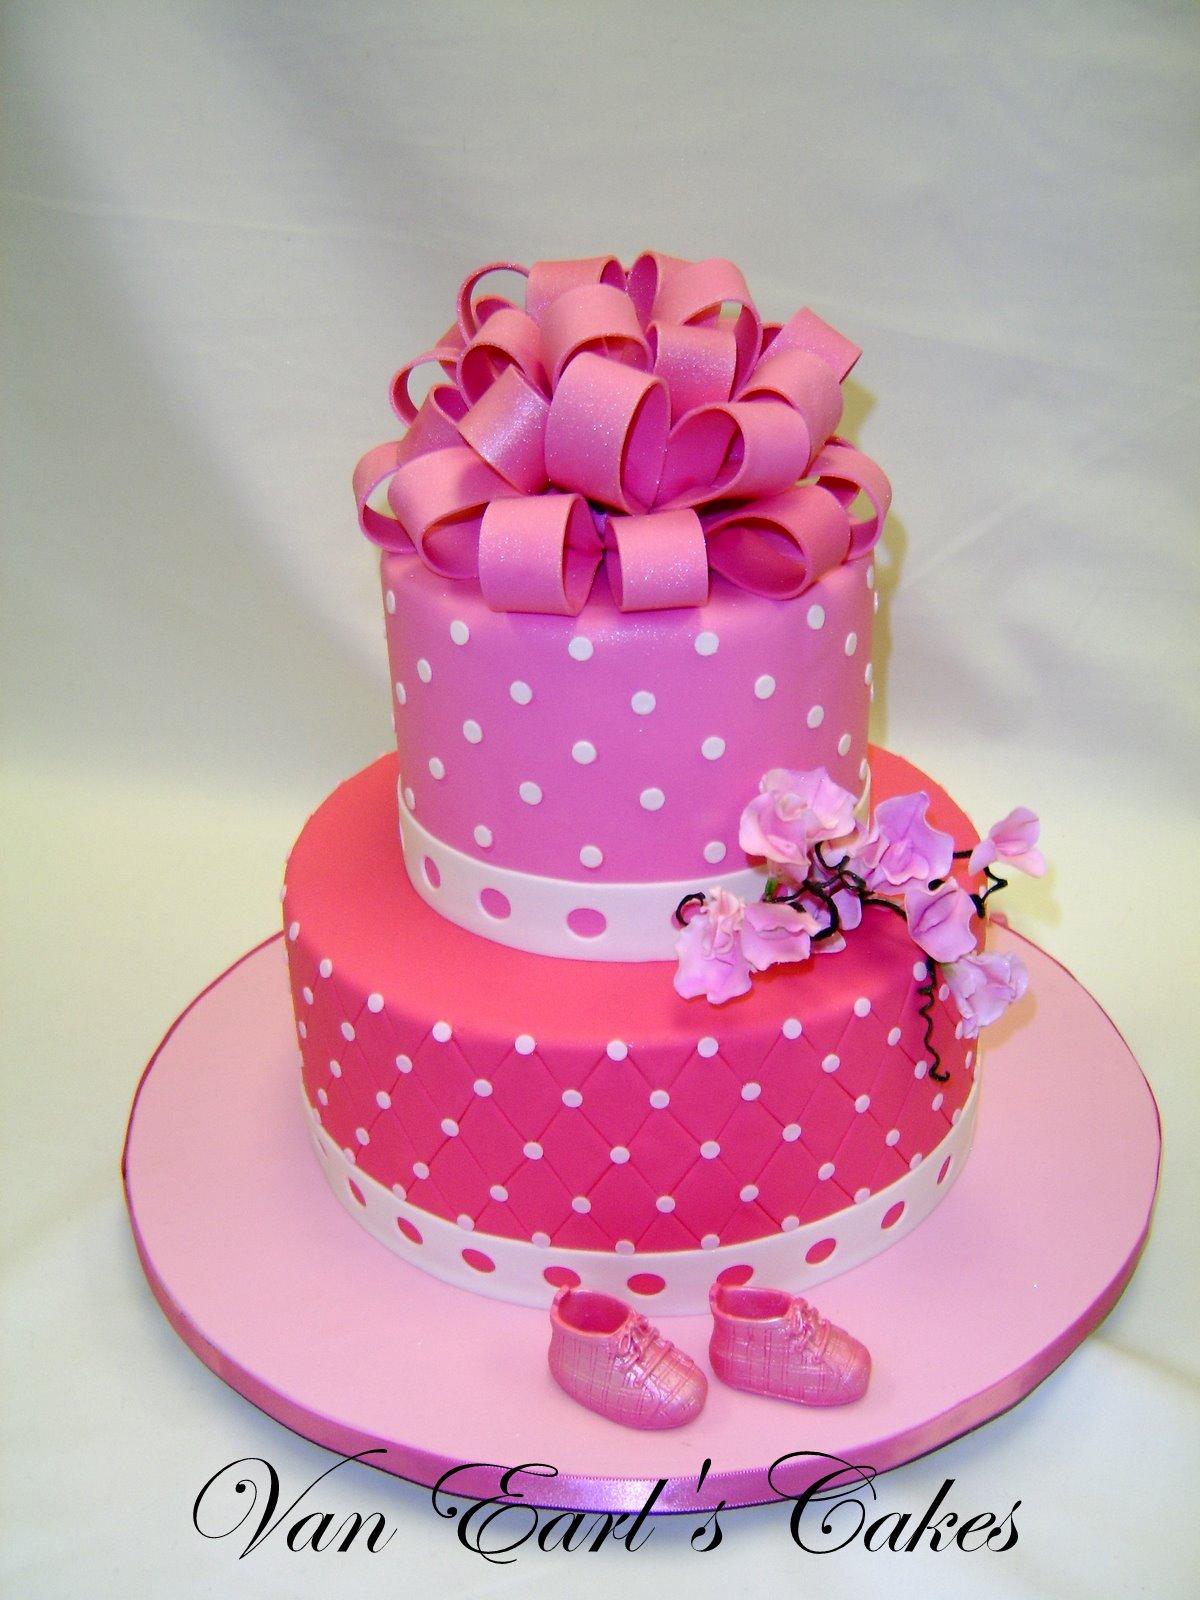 van earl 39 s cakes pink baby shower cake